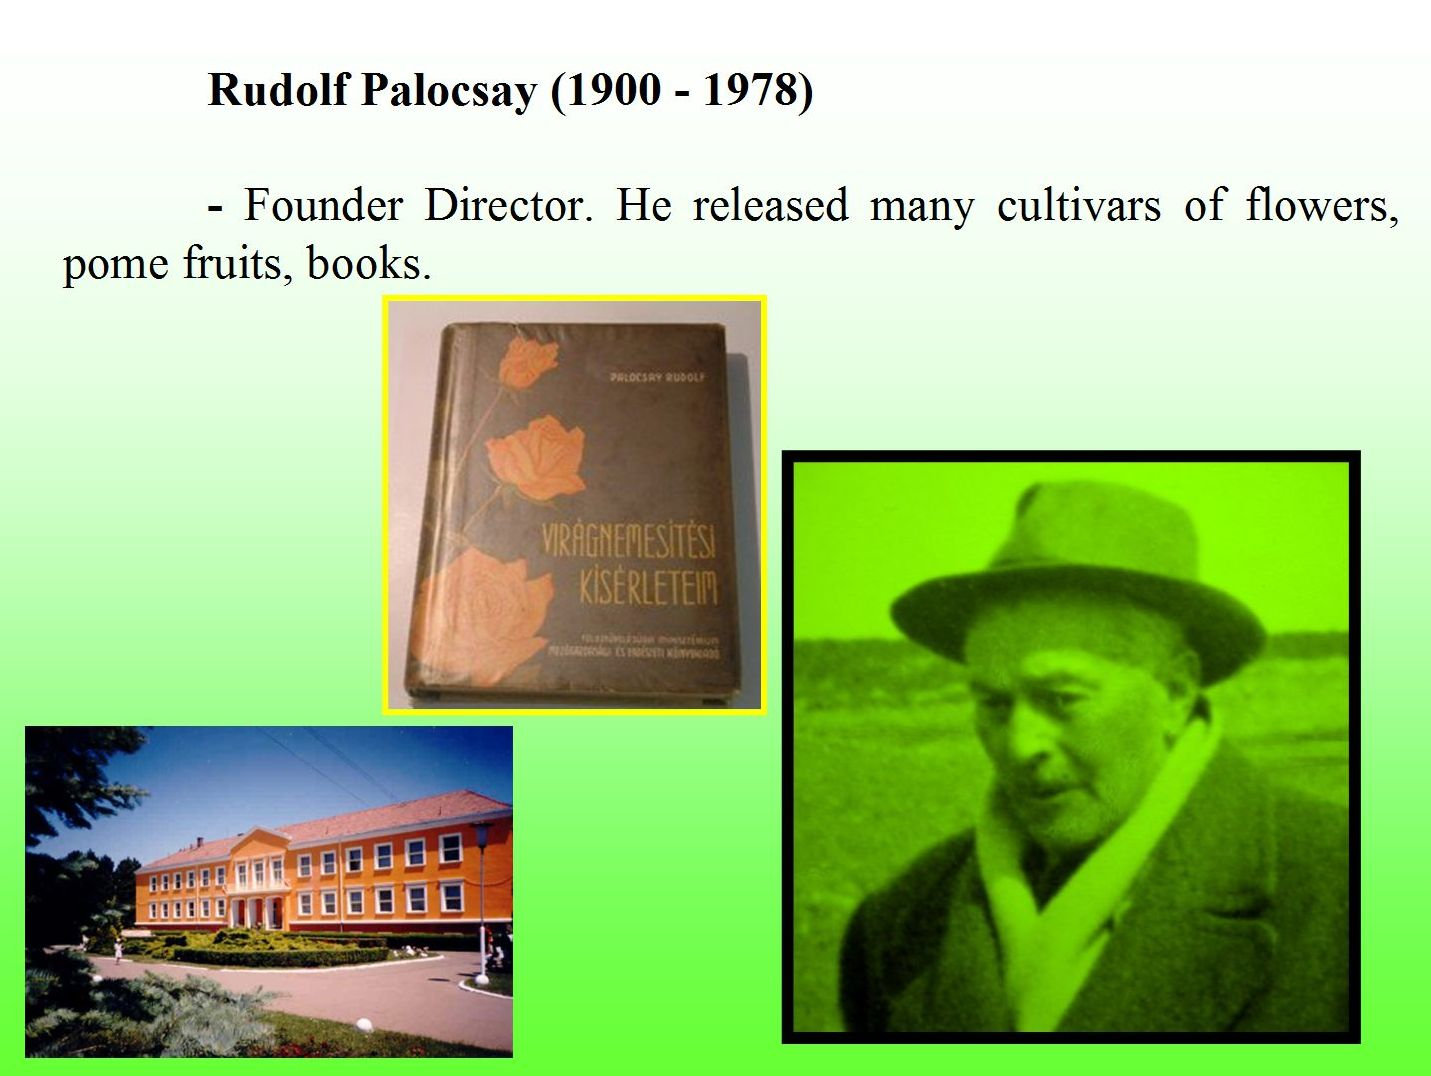 Apple and pear breeding in Cluj-Napoca, history - Rudolf Palocsay